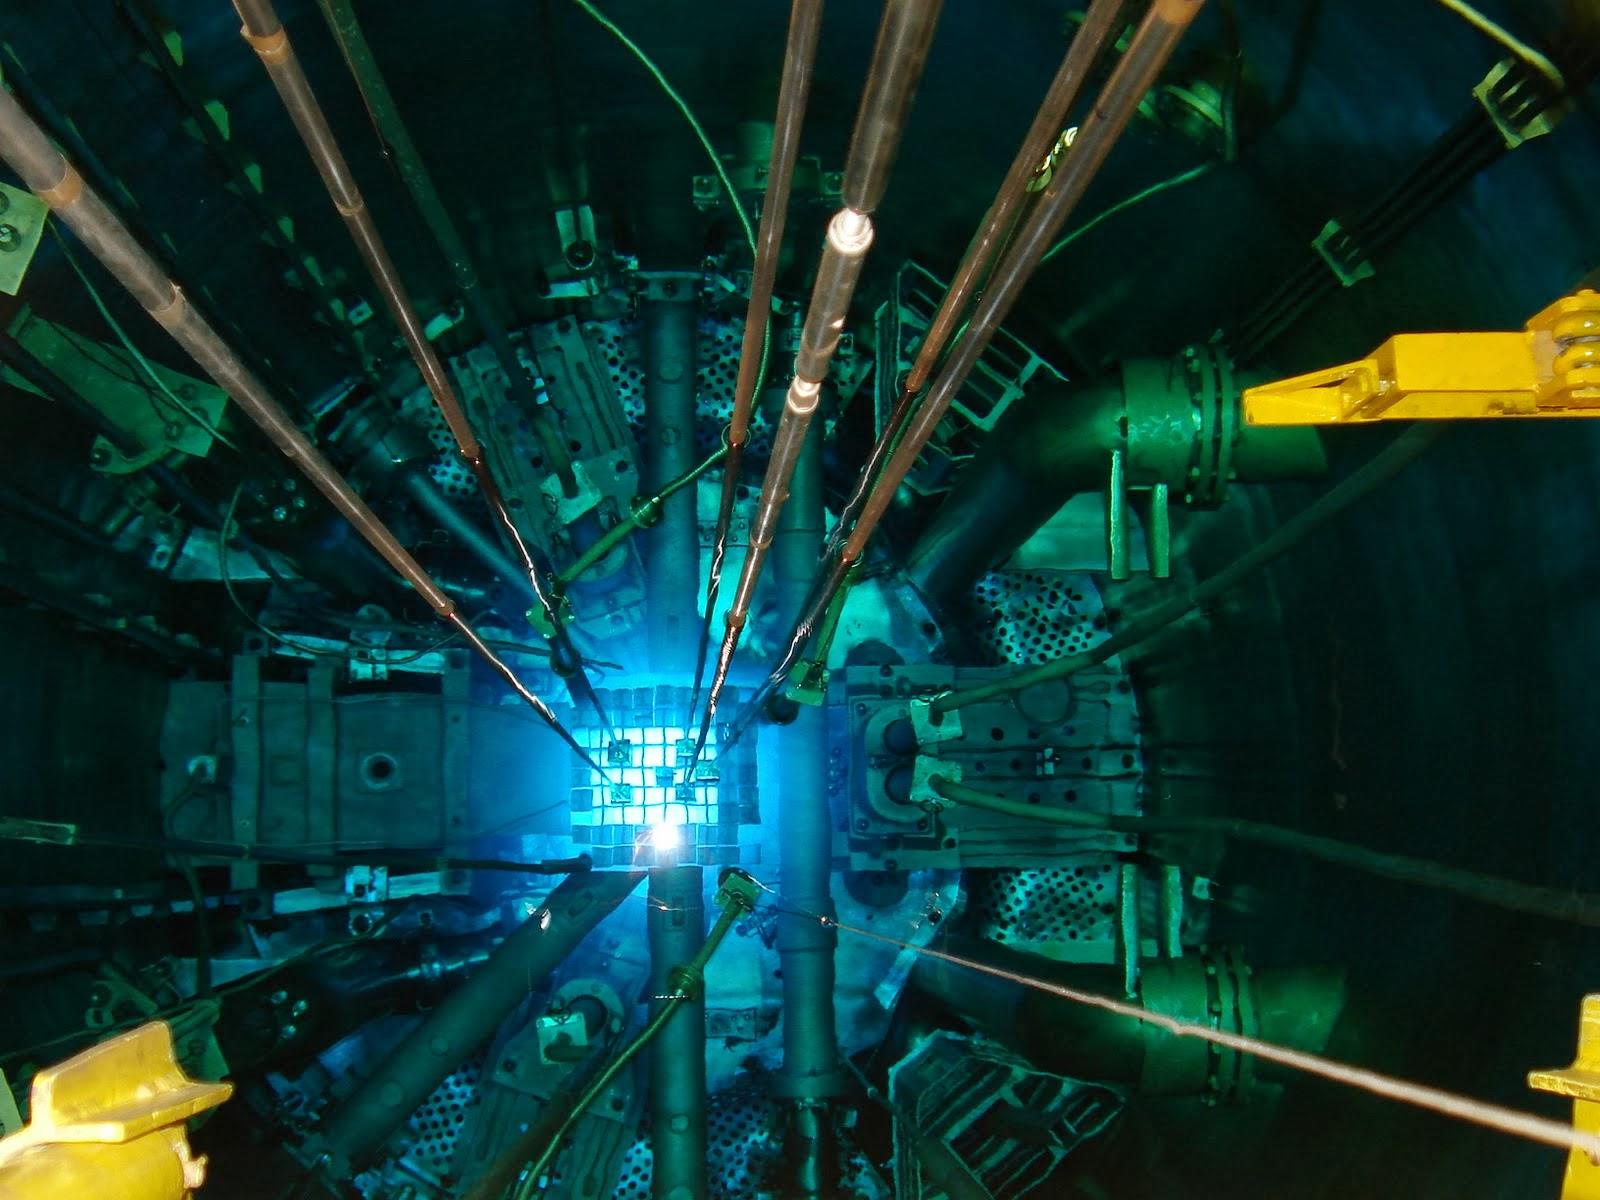 Reactor nuclear de Huarangal